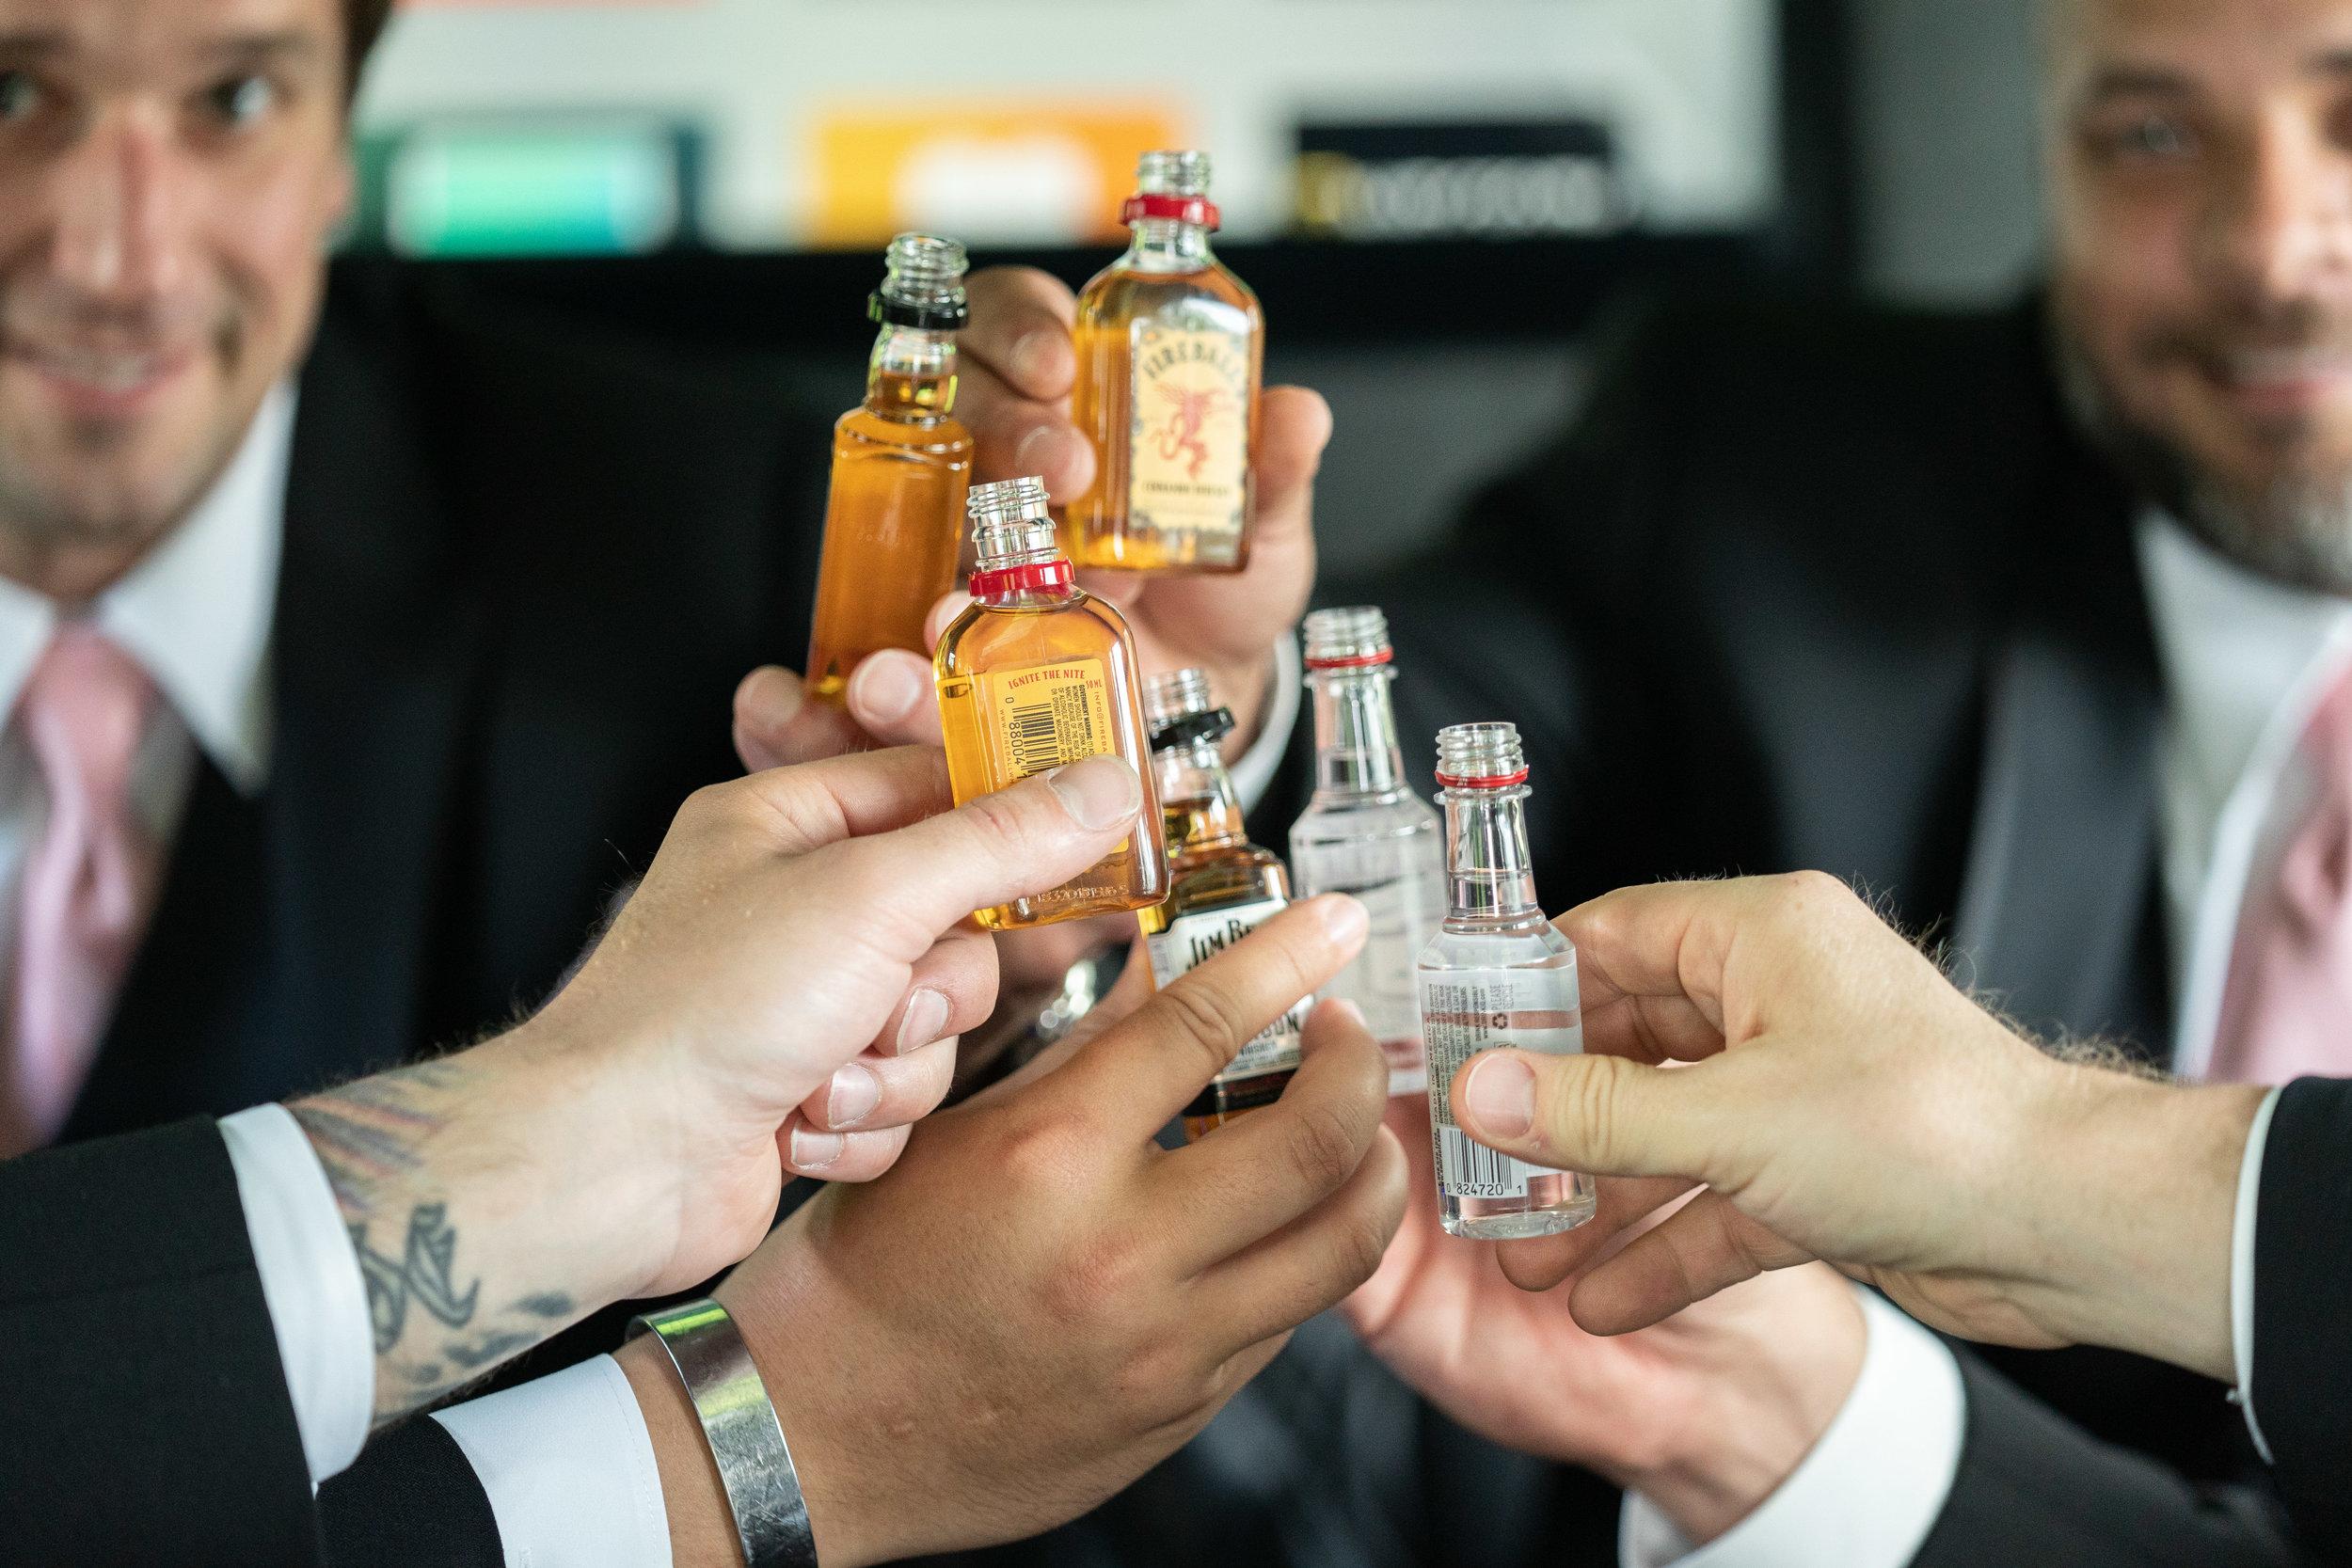 groomsmen-party-bus-limo-celebrating-marriage-cheers.jpg